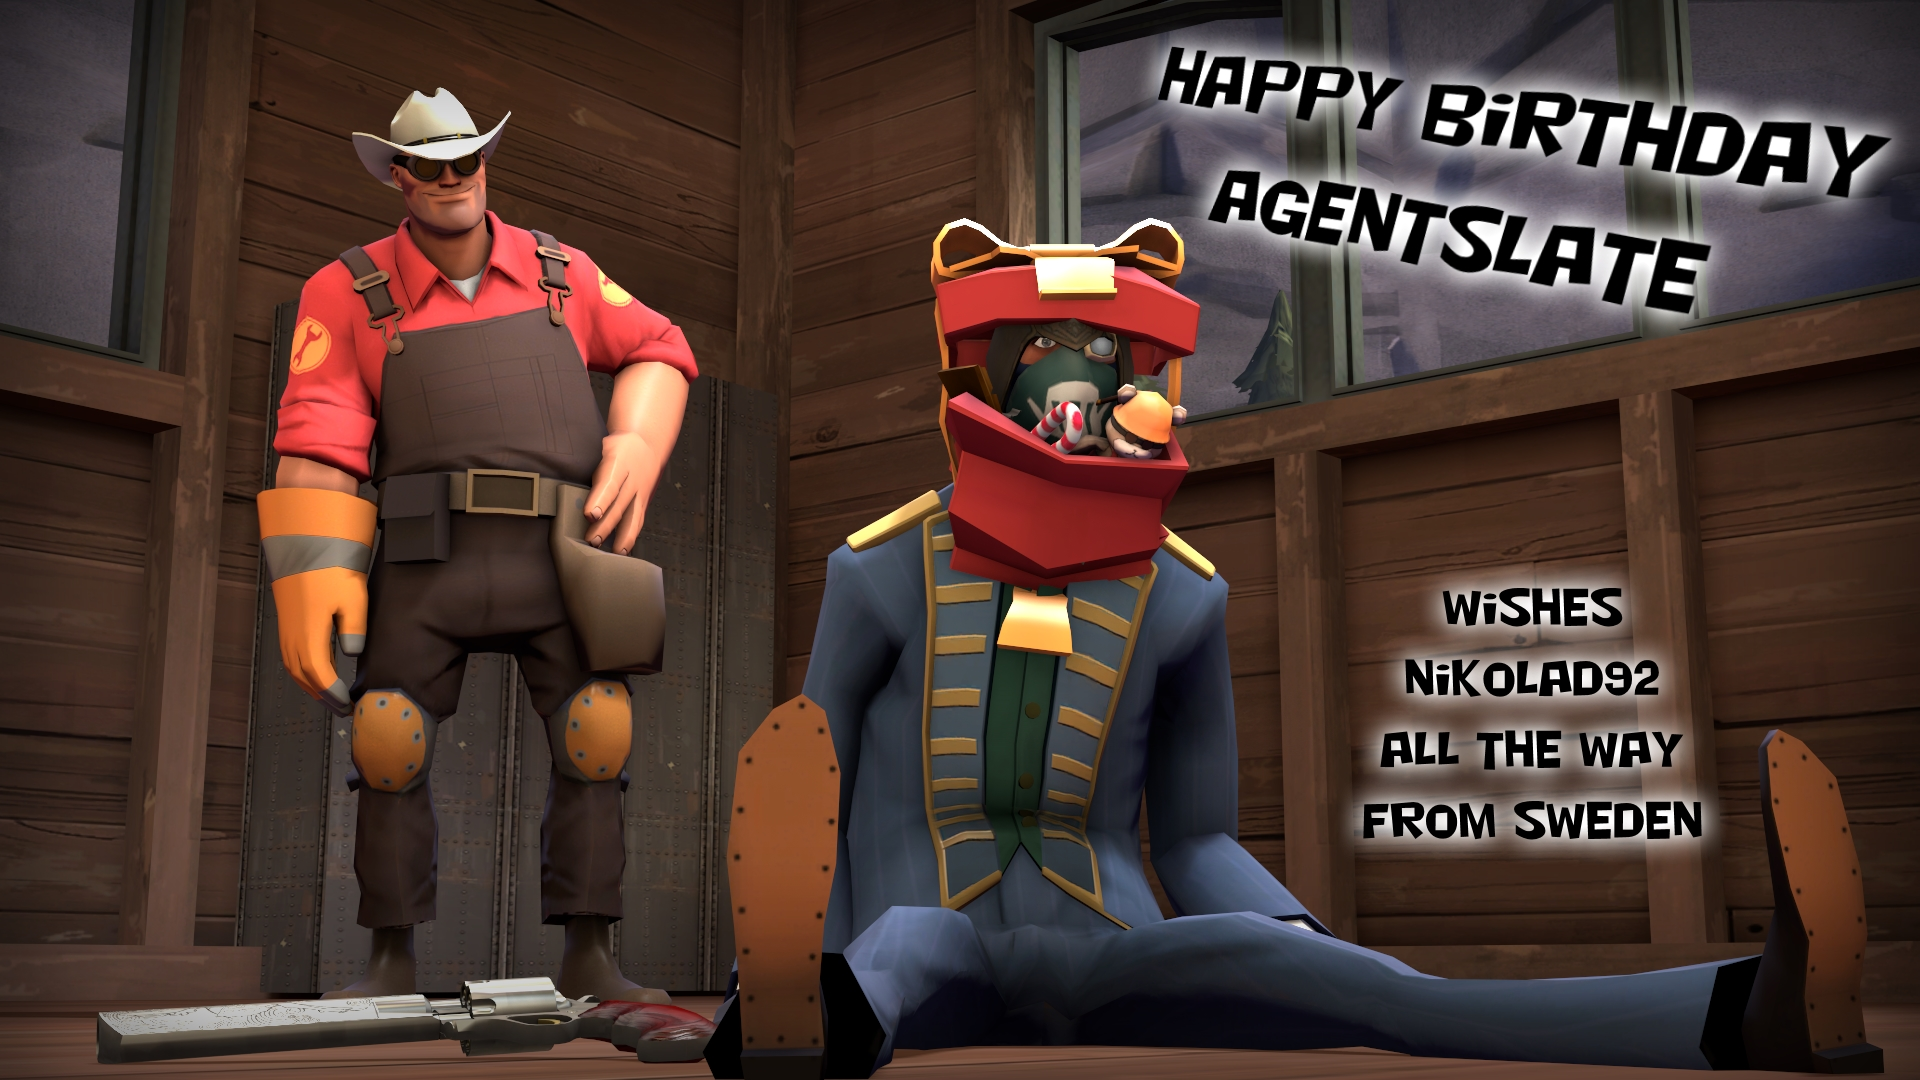 Happy BirthDay agentslate by Nikolad92